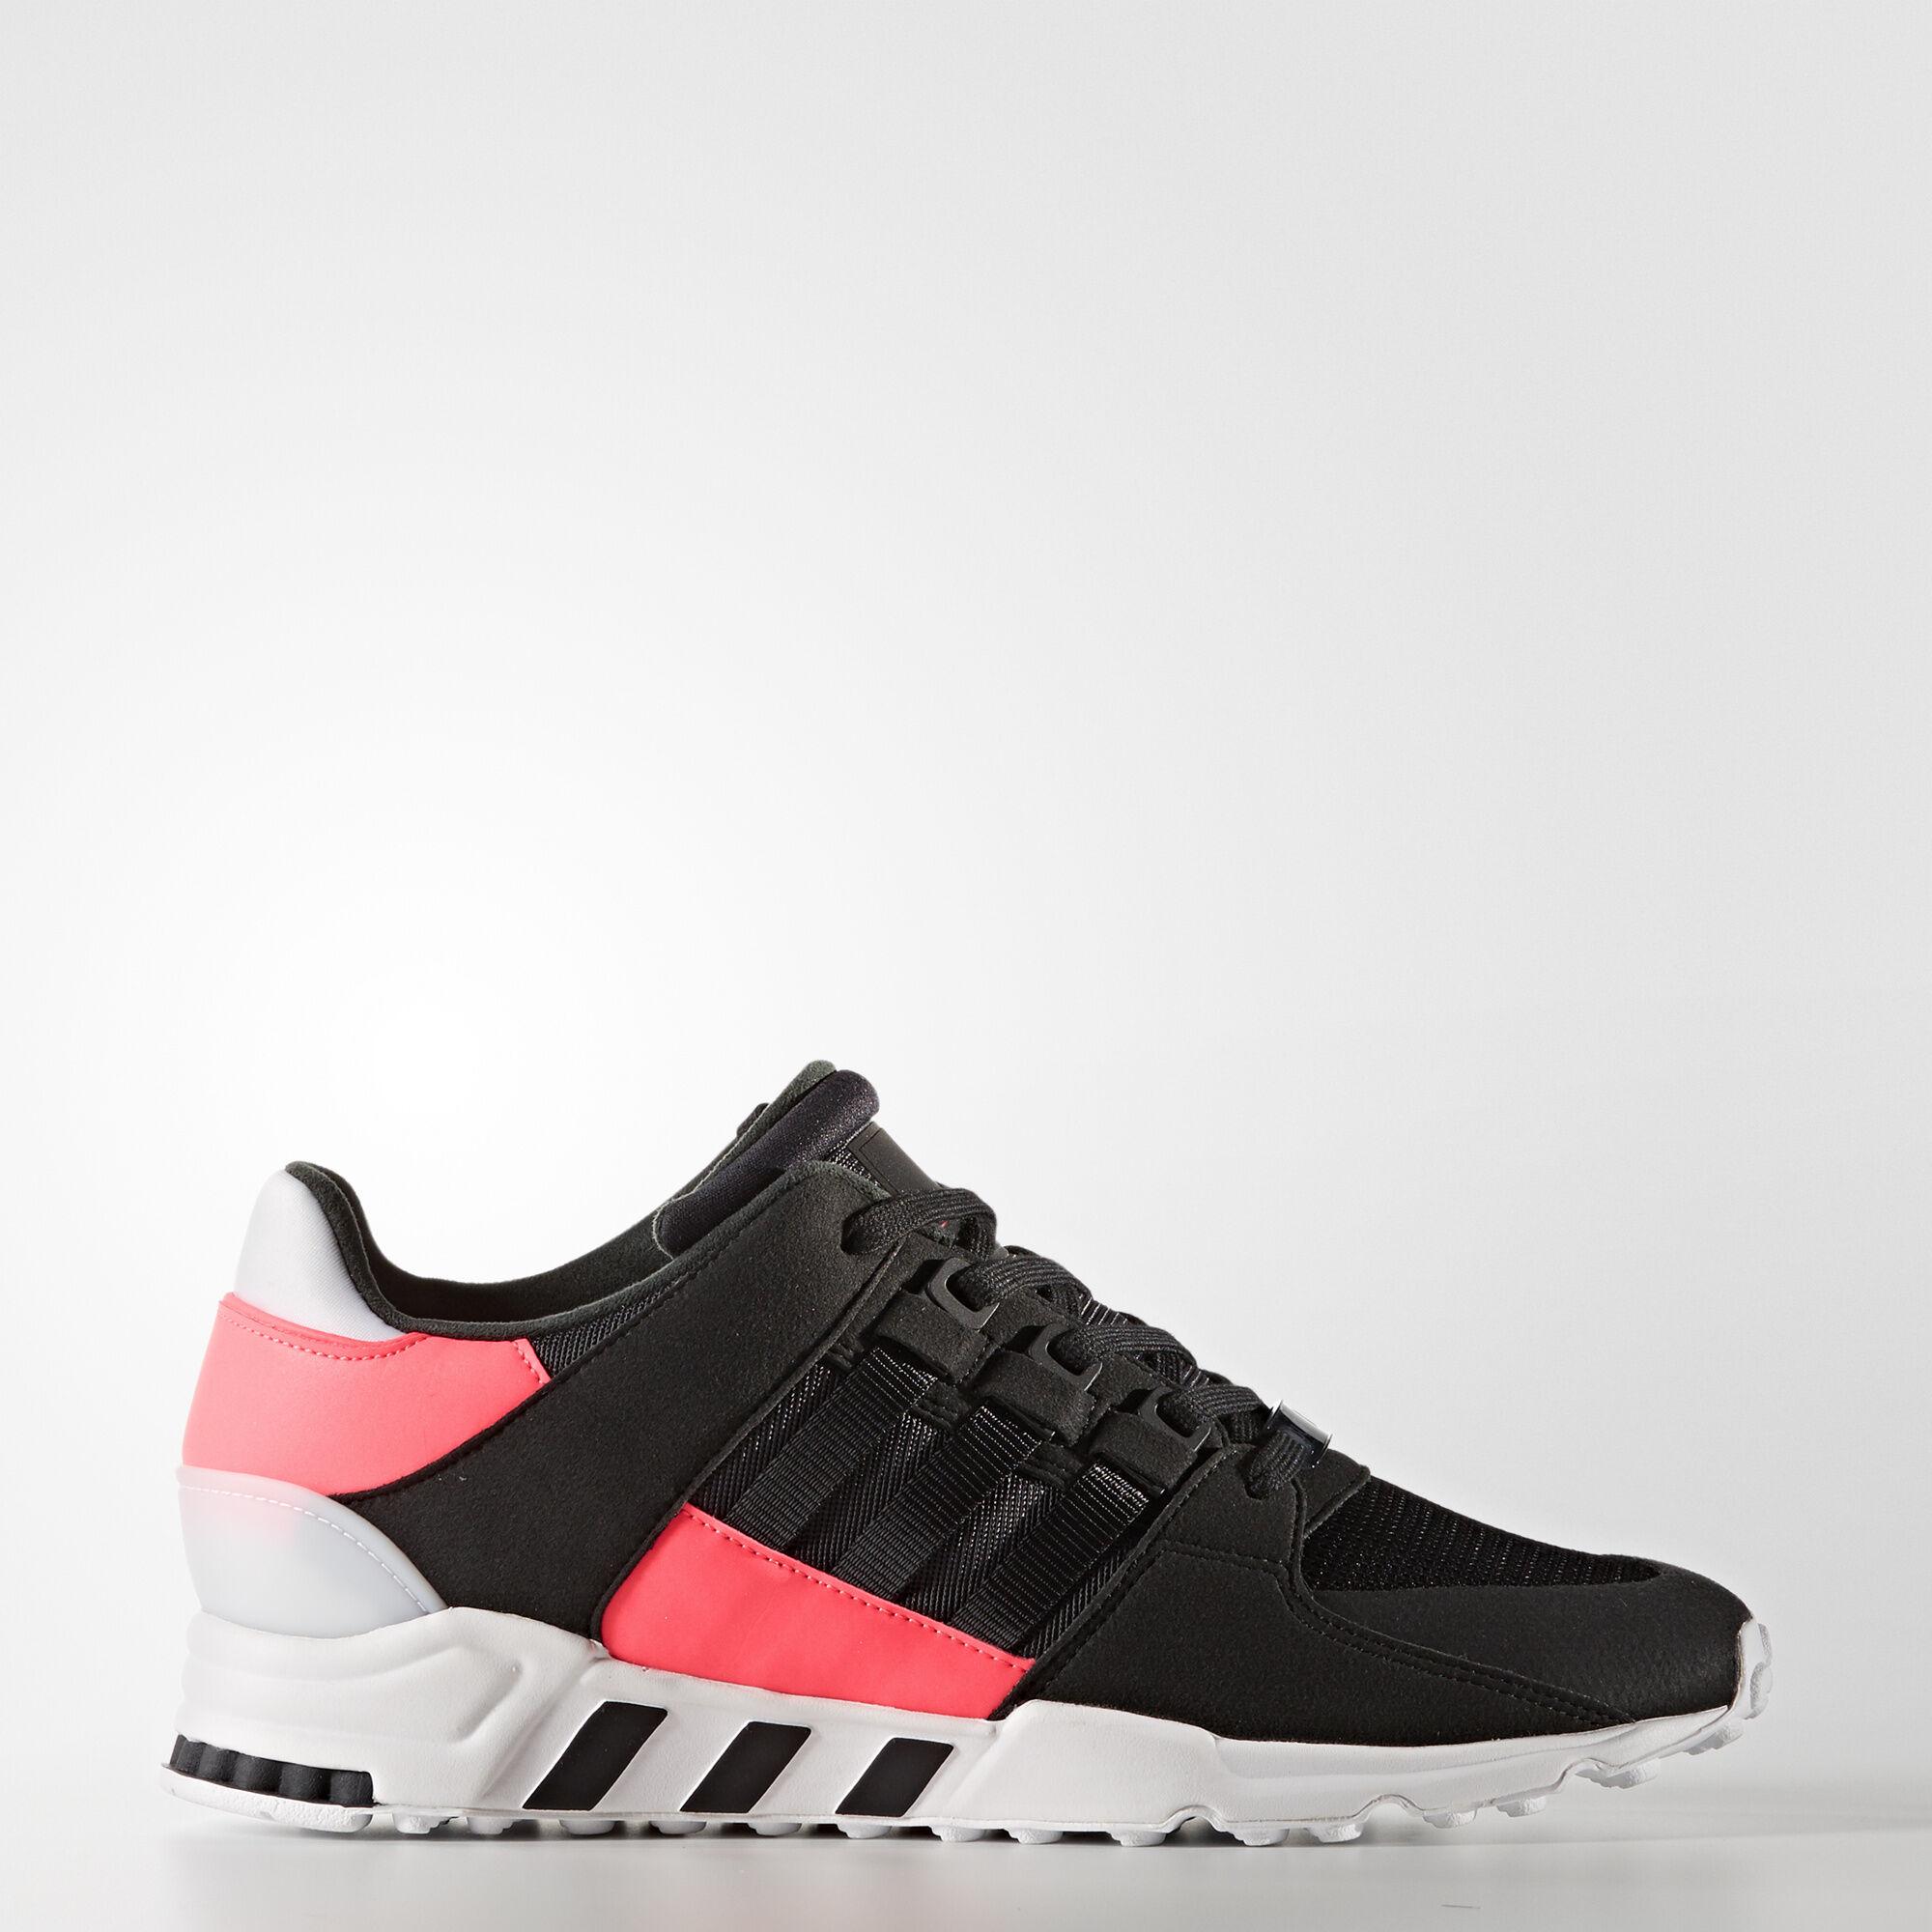 Adidas Eqt Support Online